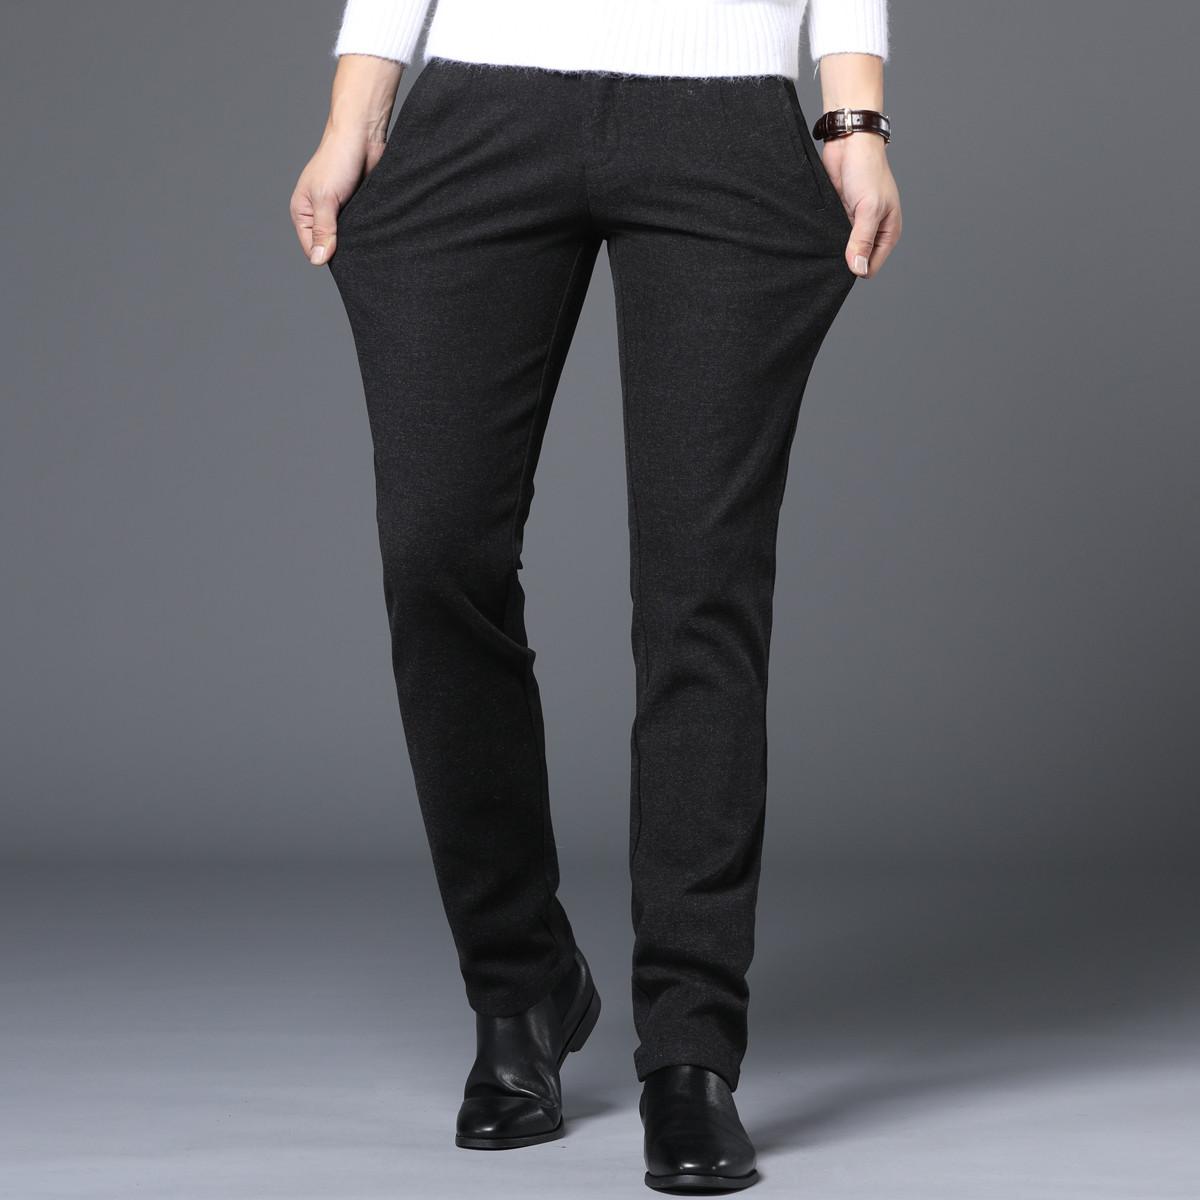 enk2019新款时尚加厚款保暖磨毛韩版微弹修身小直筒男士休闲裤EC4155078001